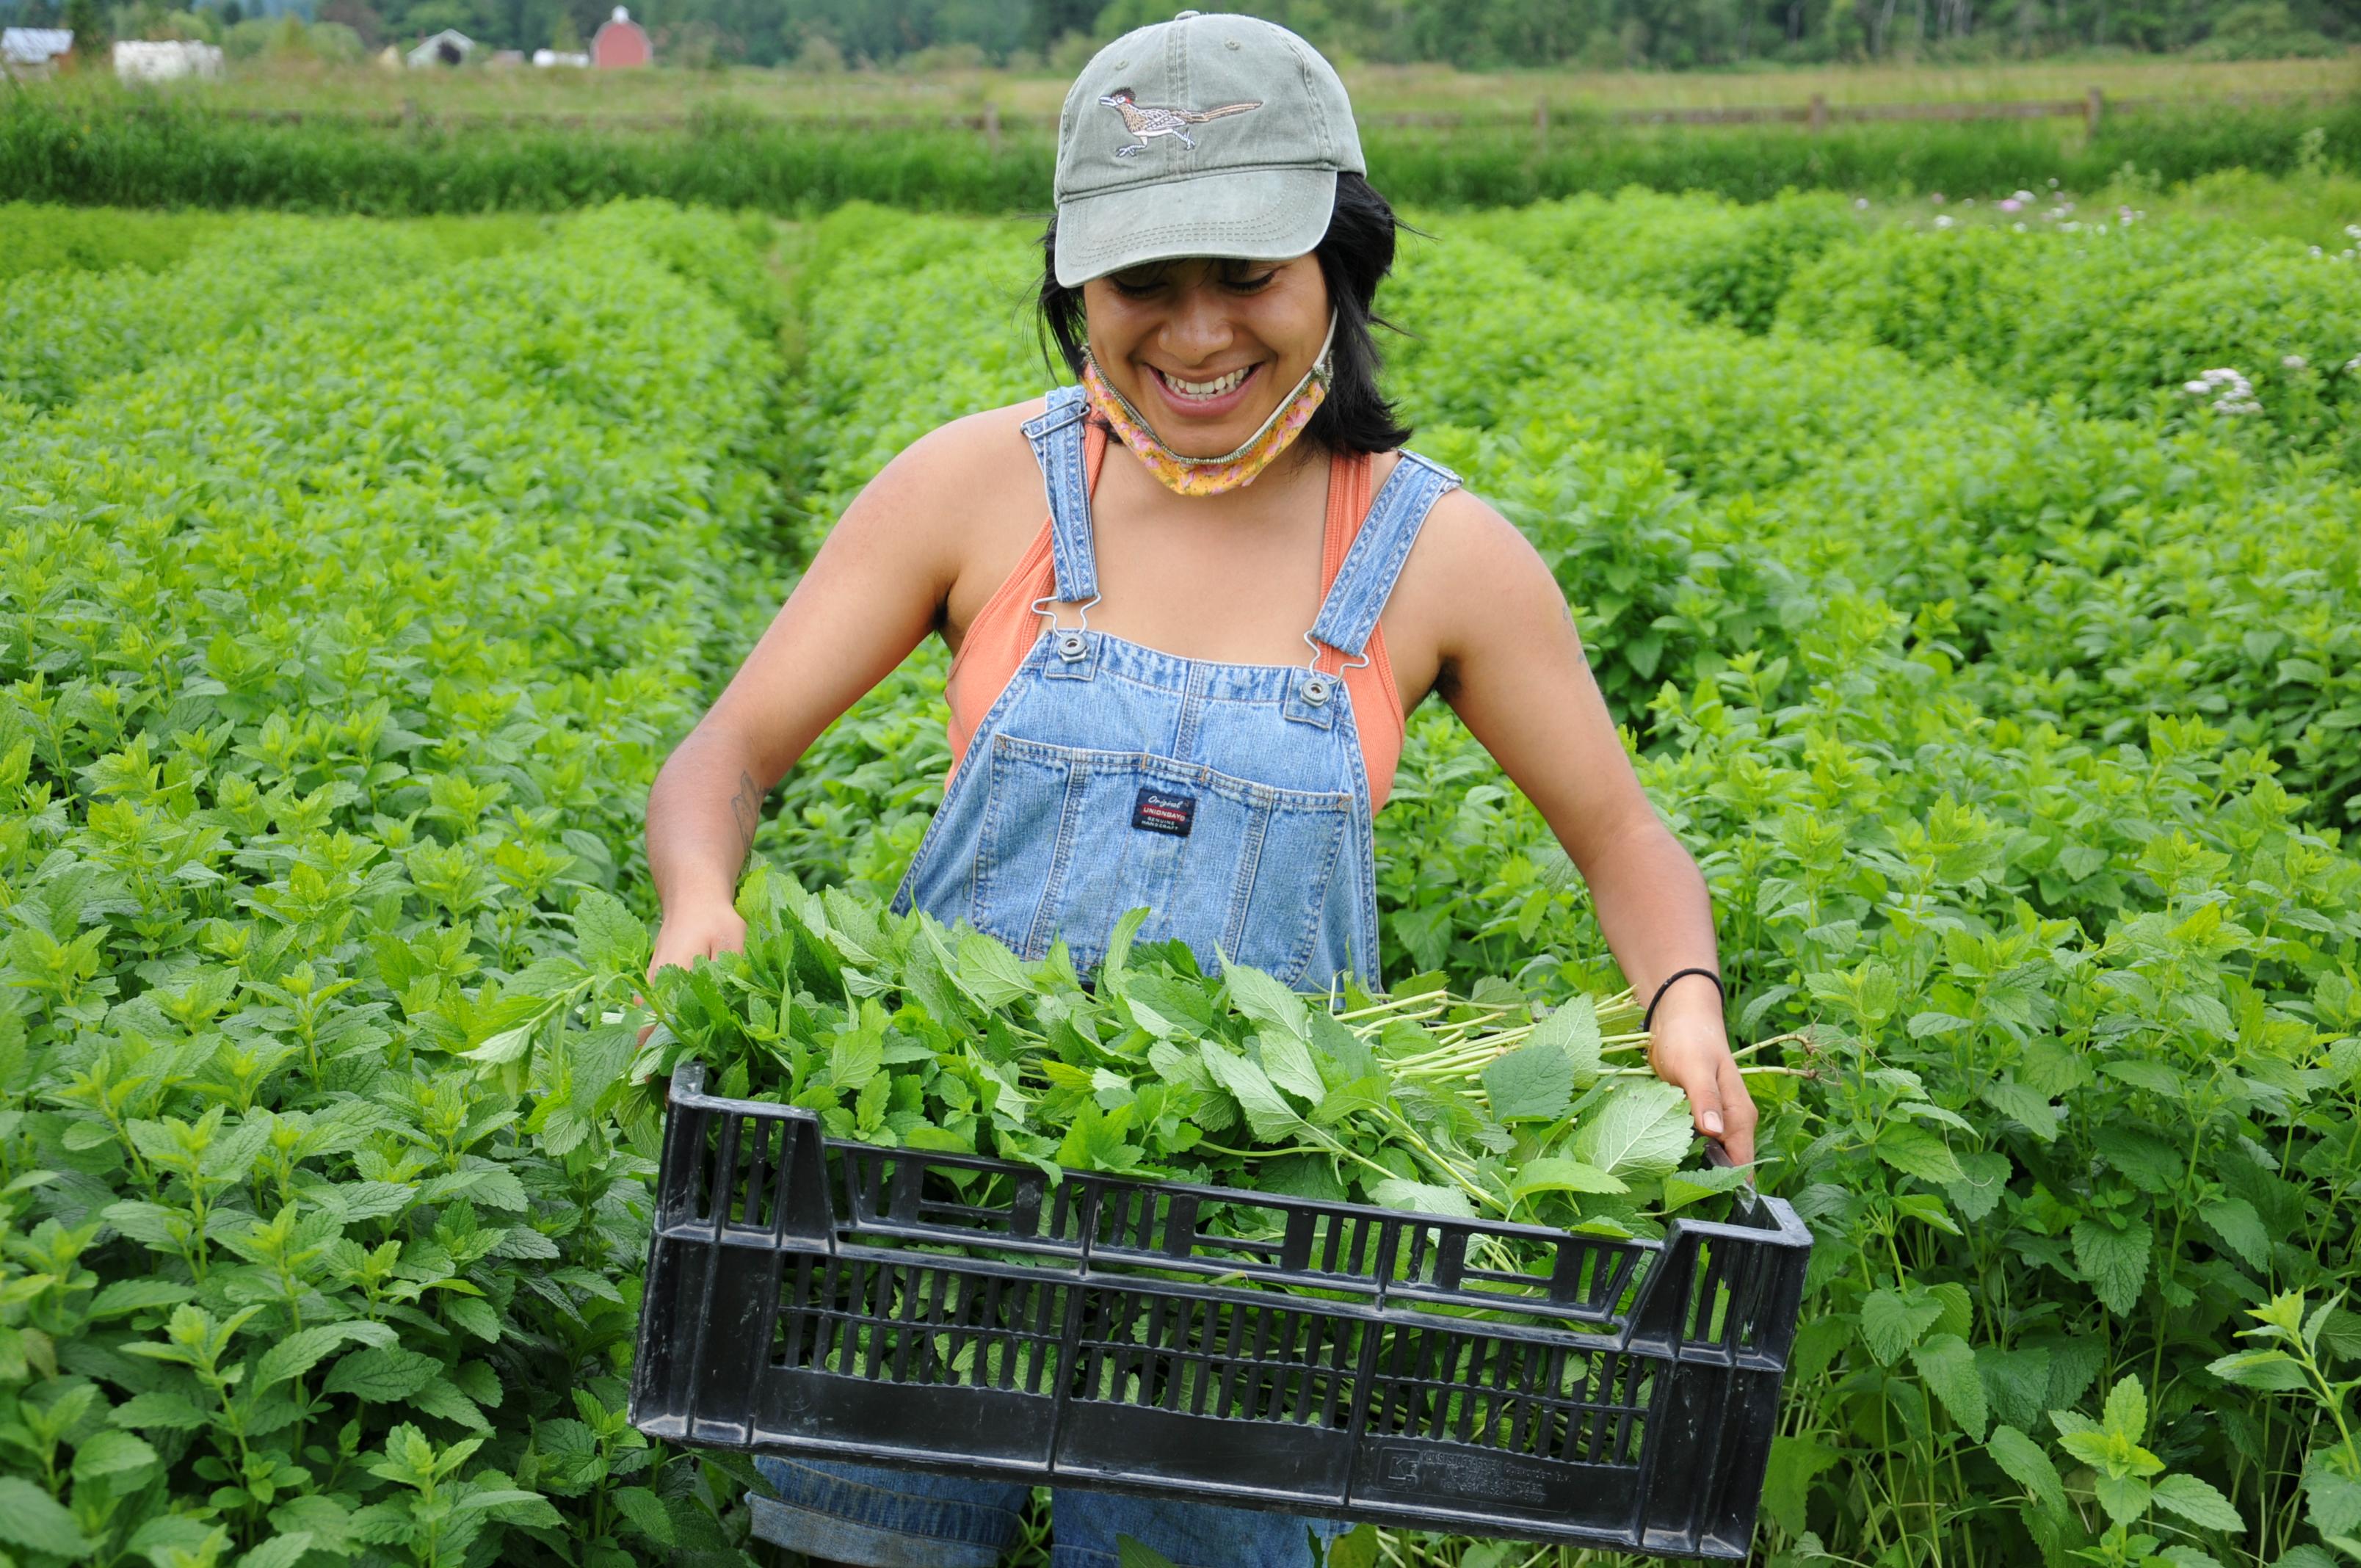 WWOOF: Travel, Live & Learn on Organic Farms